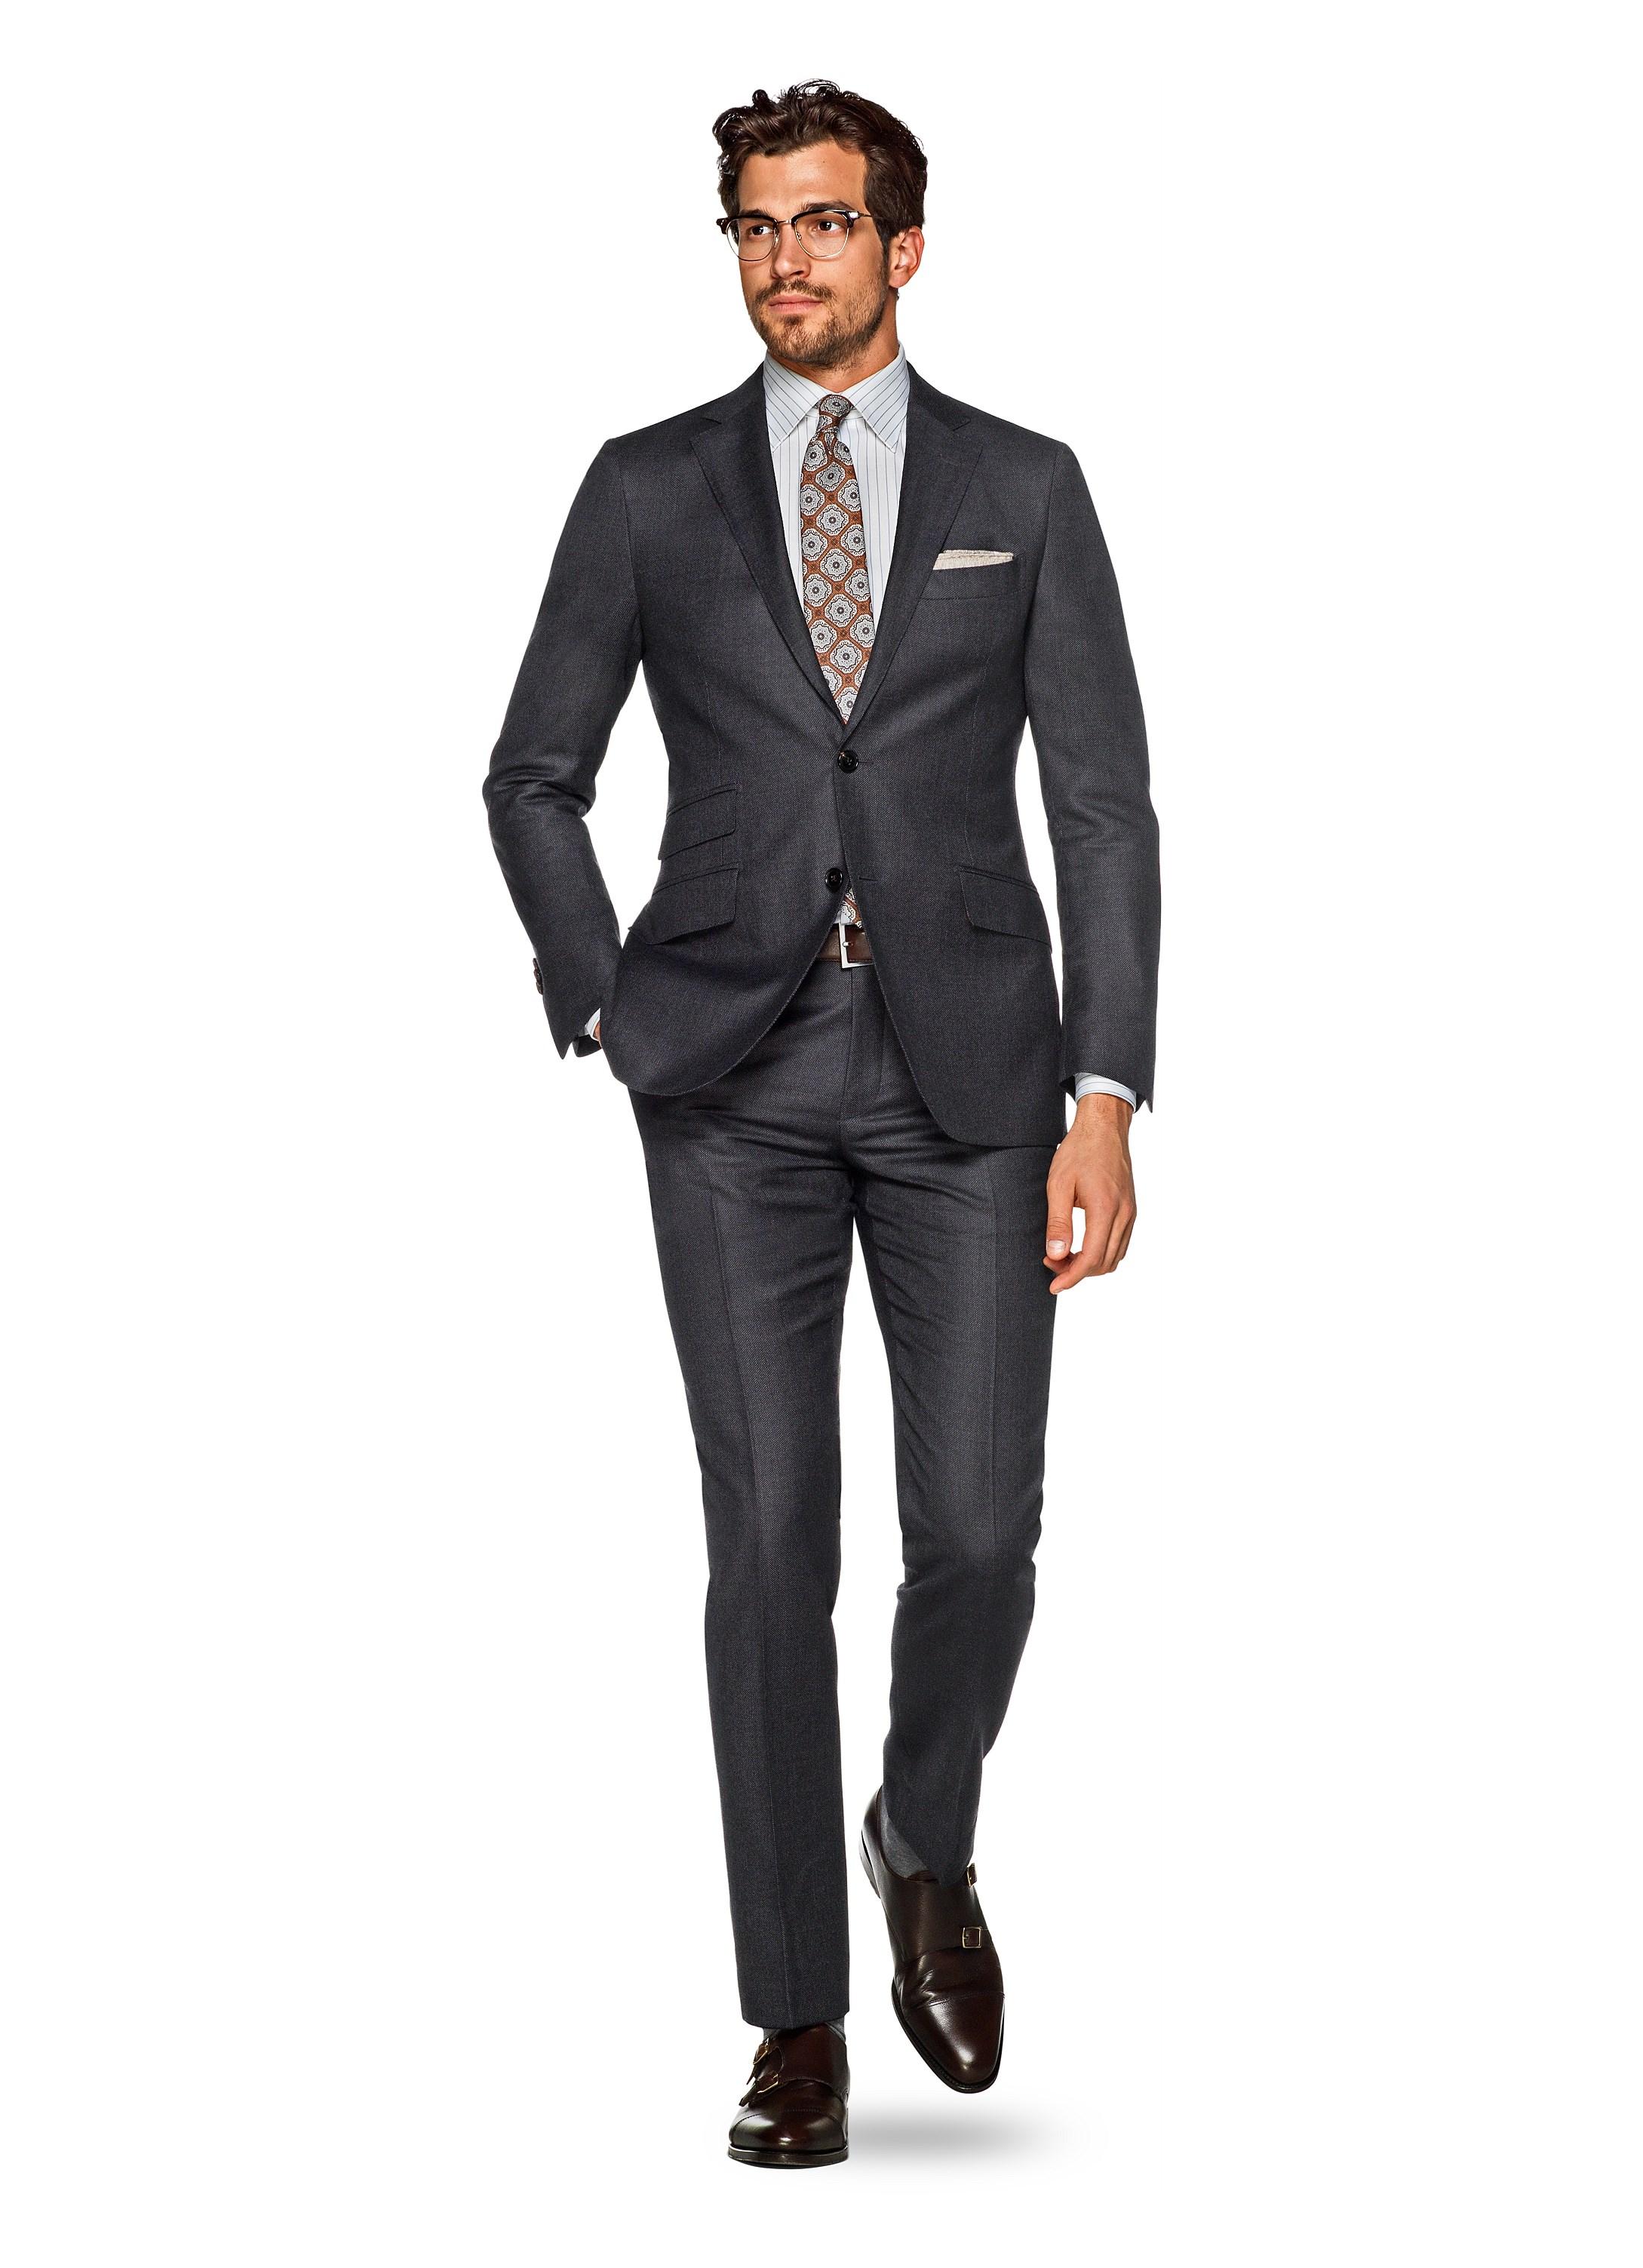 Suits_Grey_Birds_Eye_Sienna_P2444_Suitsupply_Online_Store_1.jpg